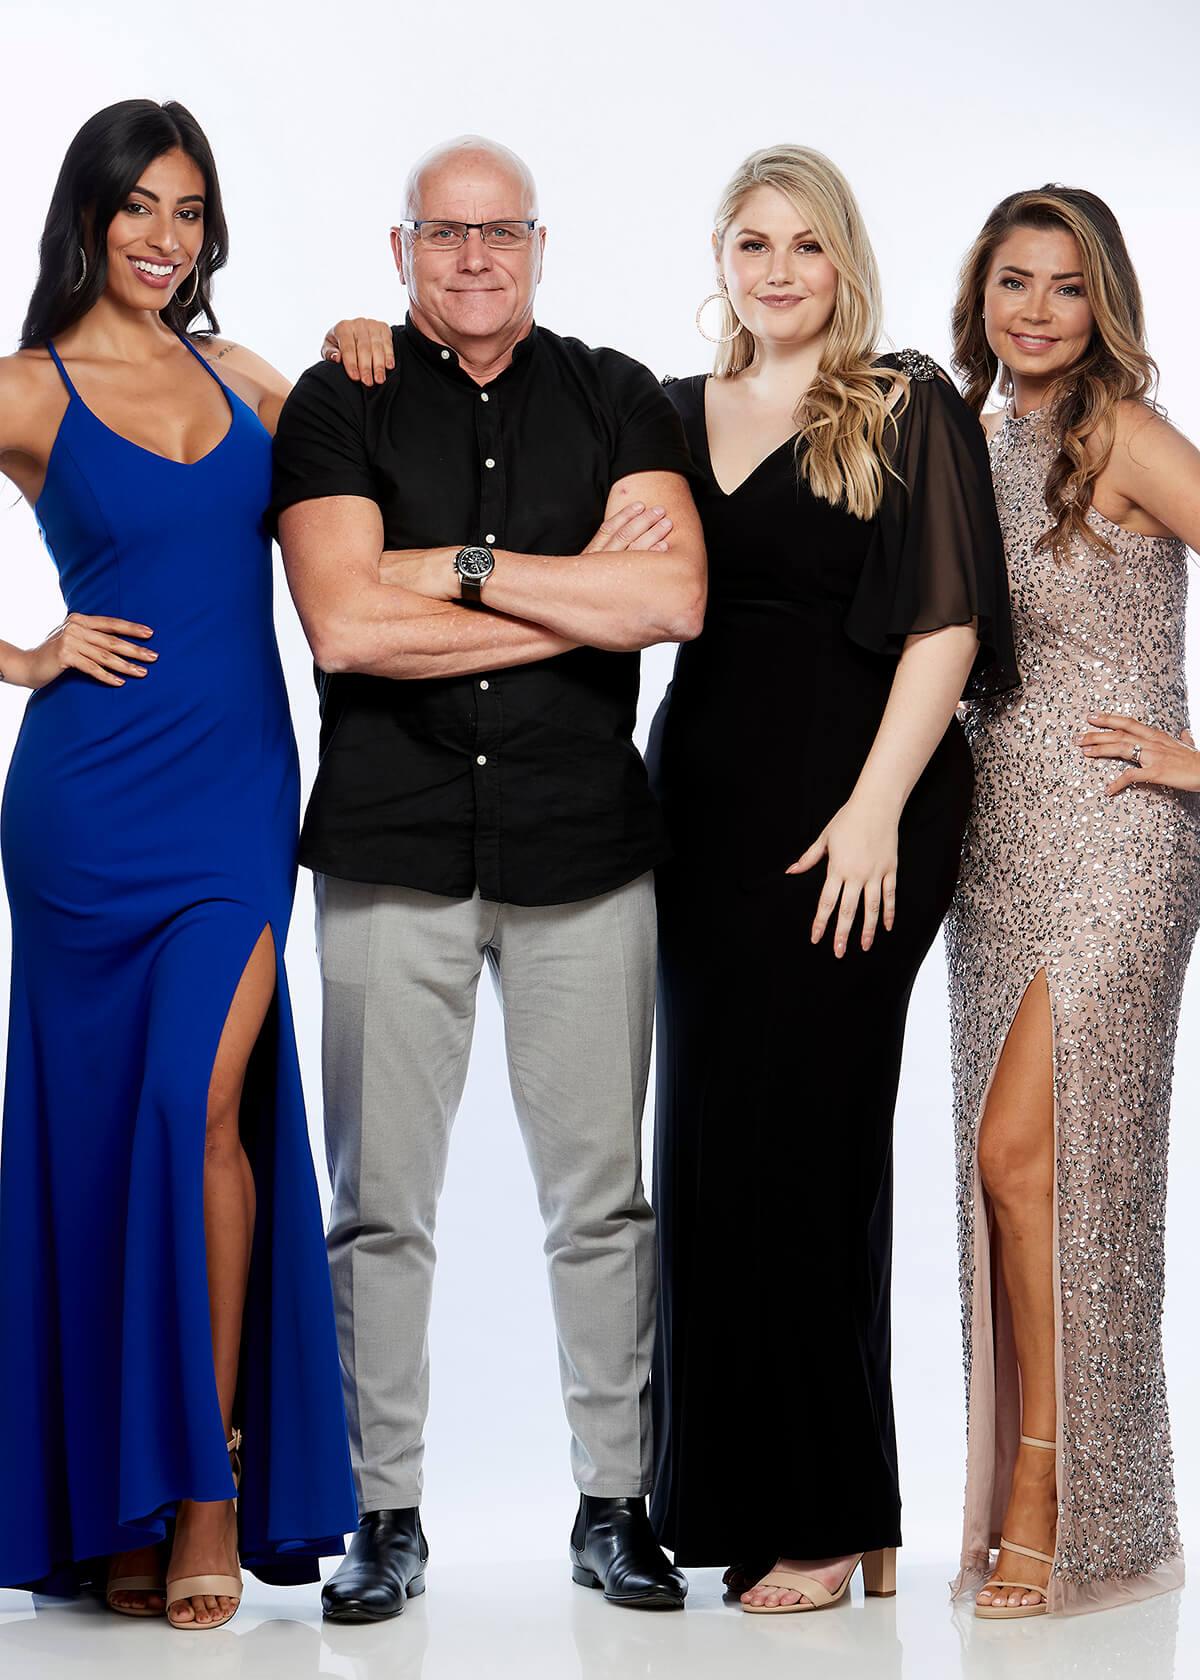 Martin J Sanders with models for his brands Zaliea, Layla Jones and Jesse Harper